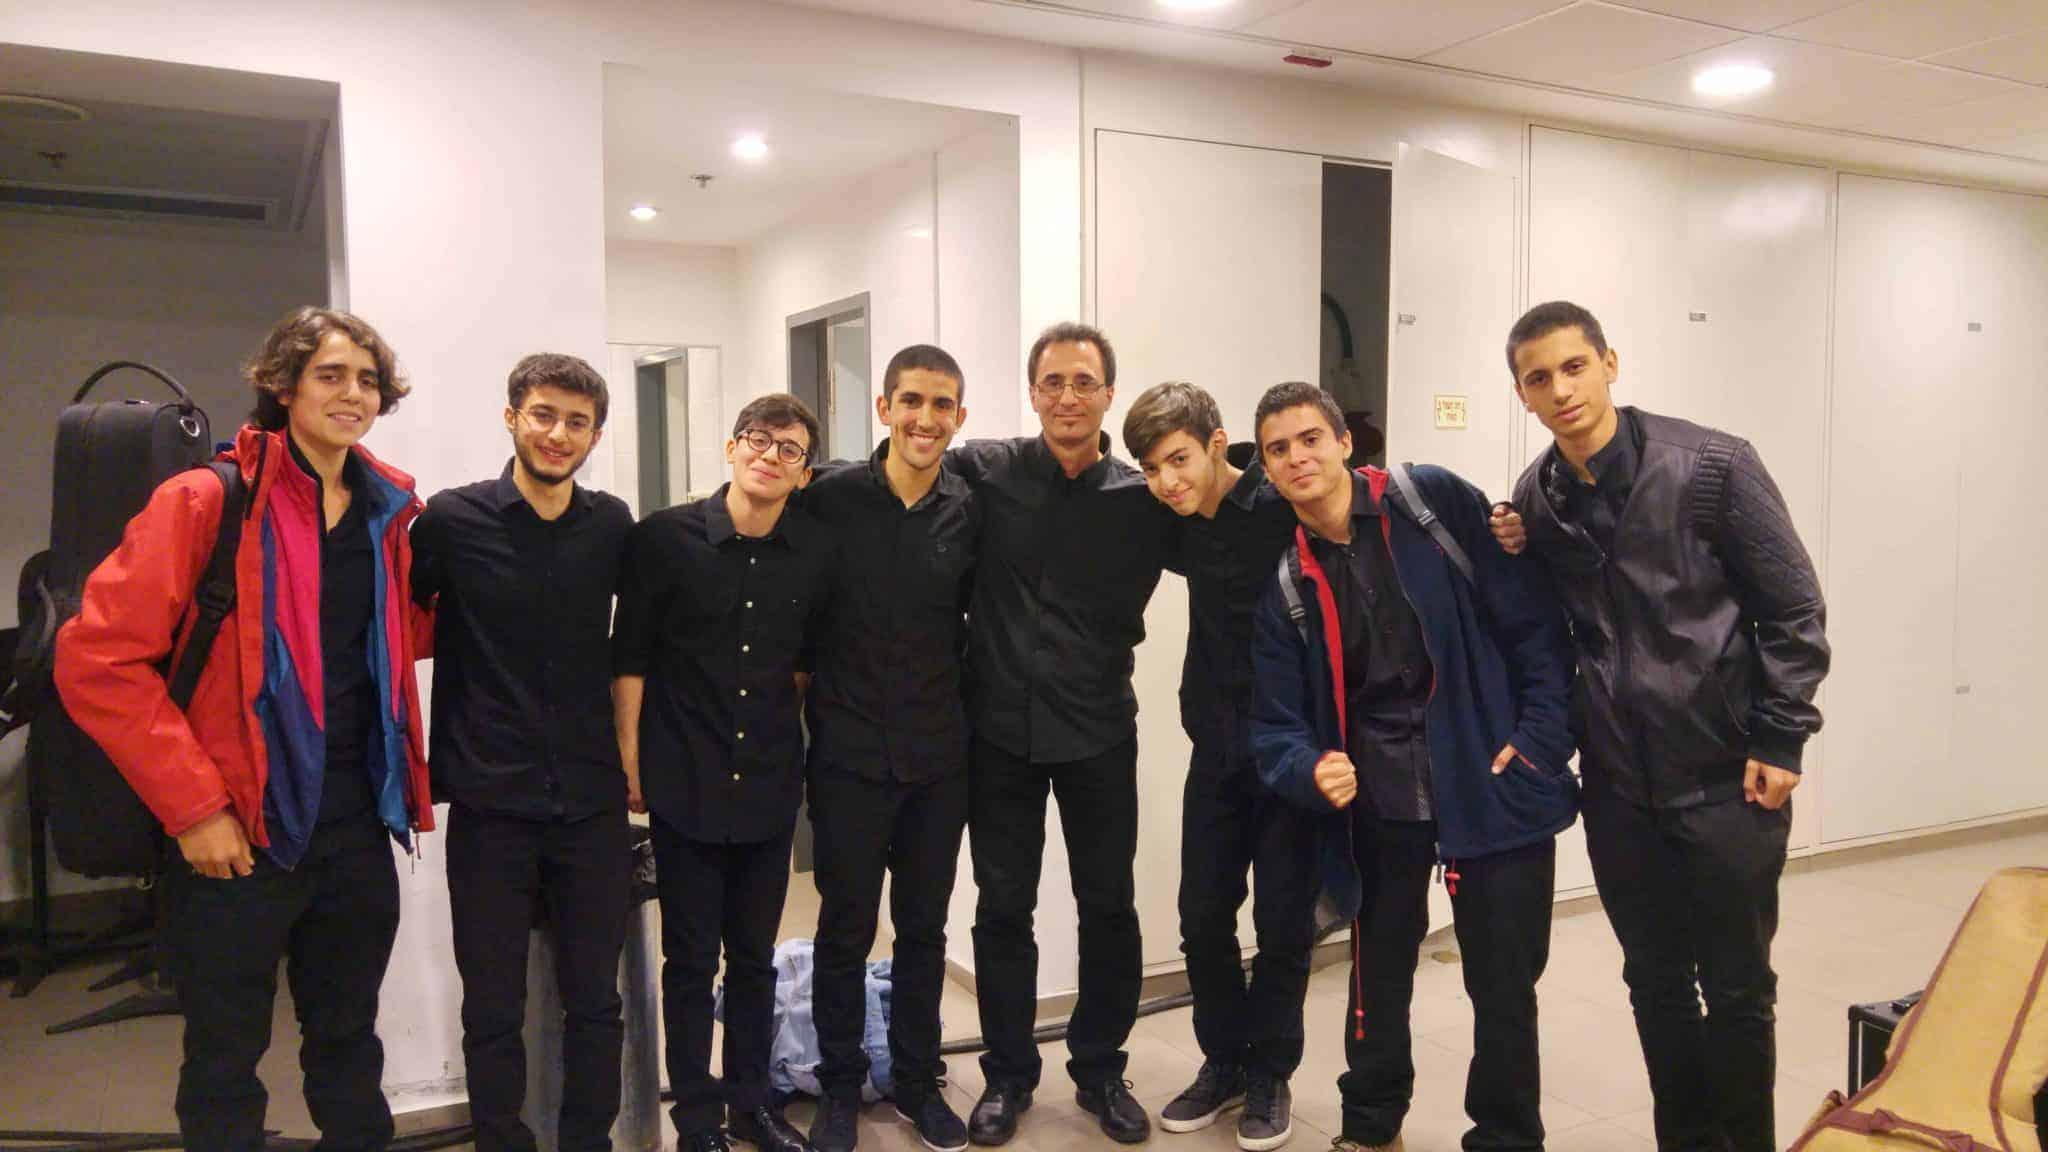 Alec with ICM Student Jazz Ensemble